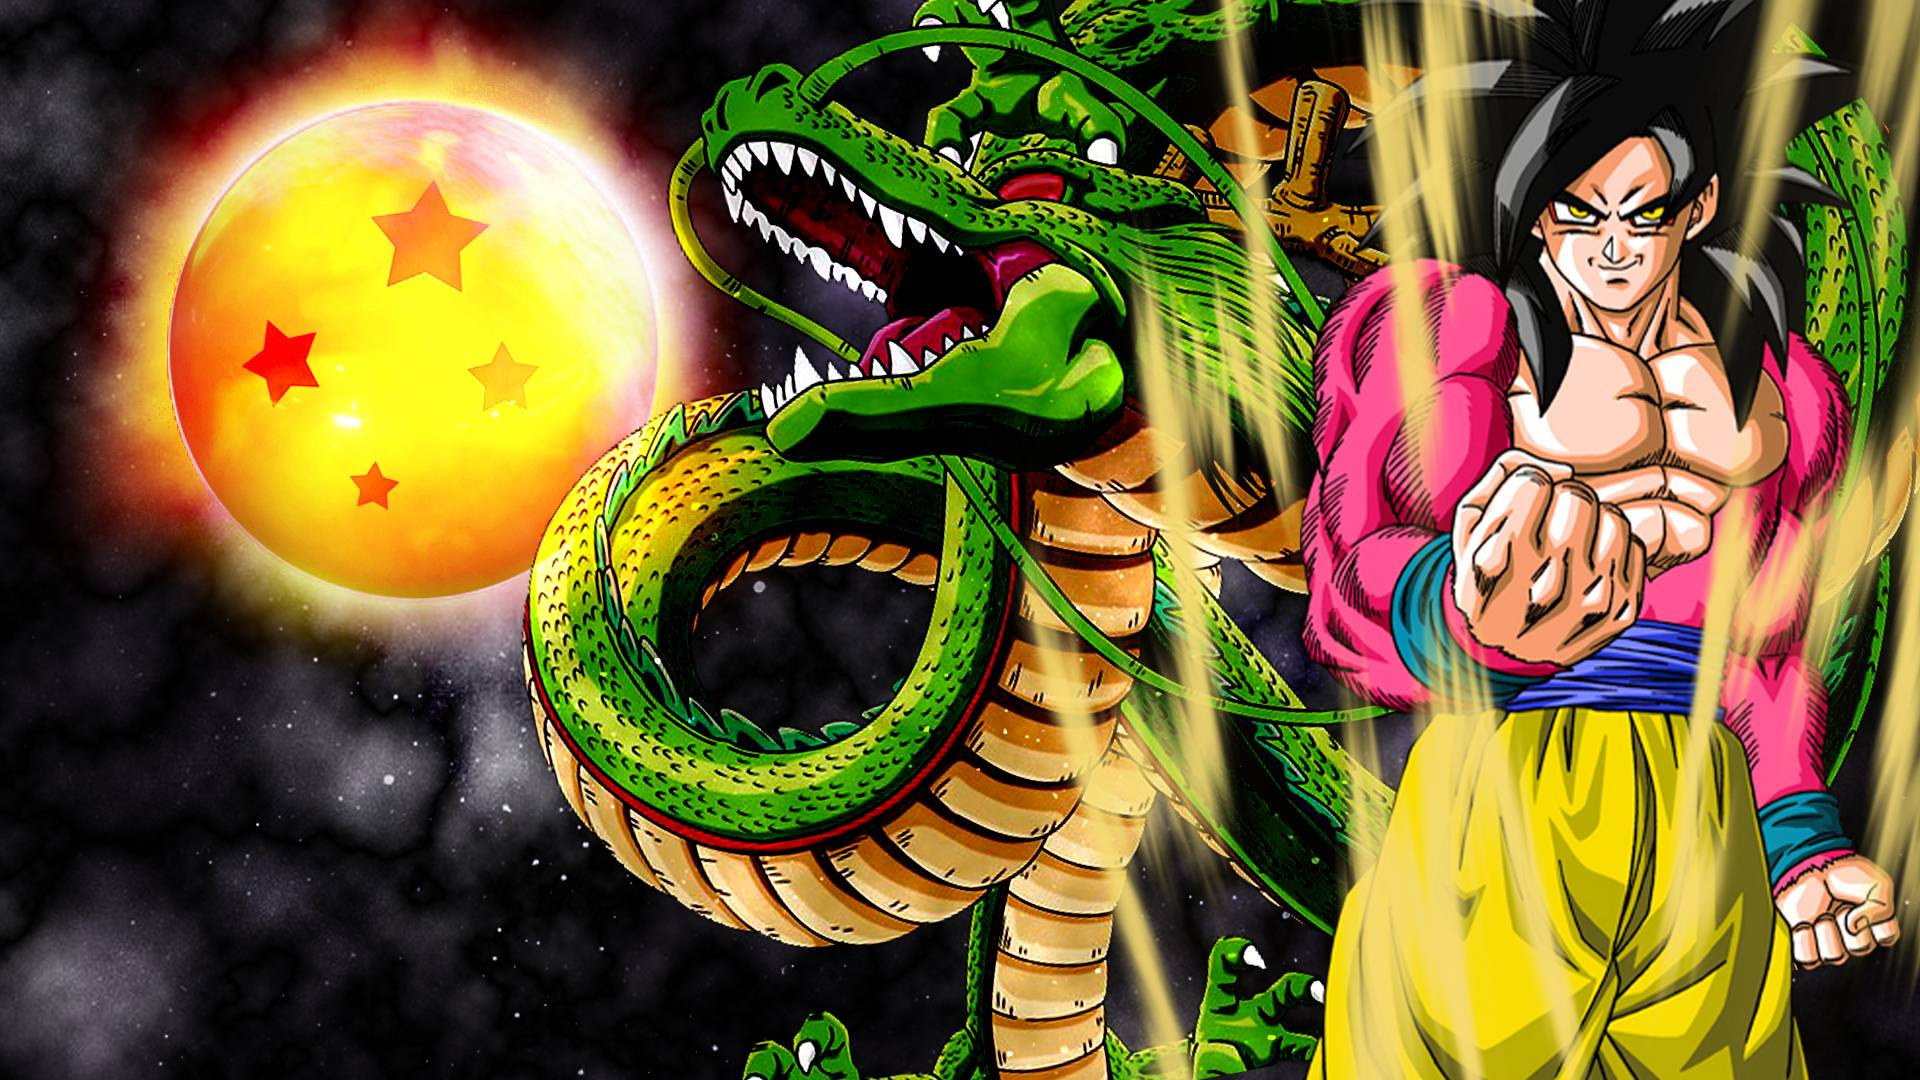 Wonderful Wallpaper Naruto Dbz - goku-super-saiyan-4-hd-wallpaper-30  Pictures_842690.jpg